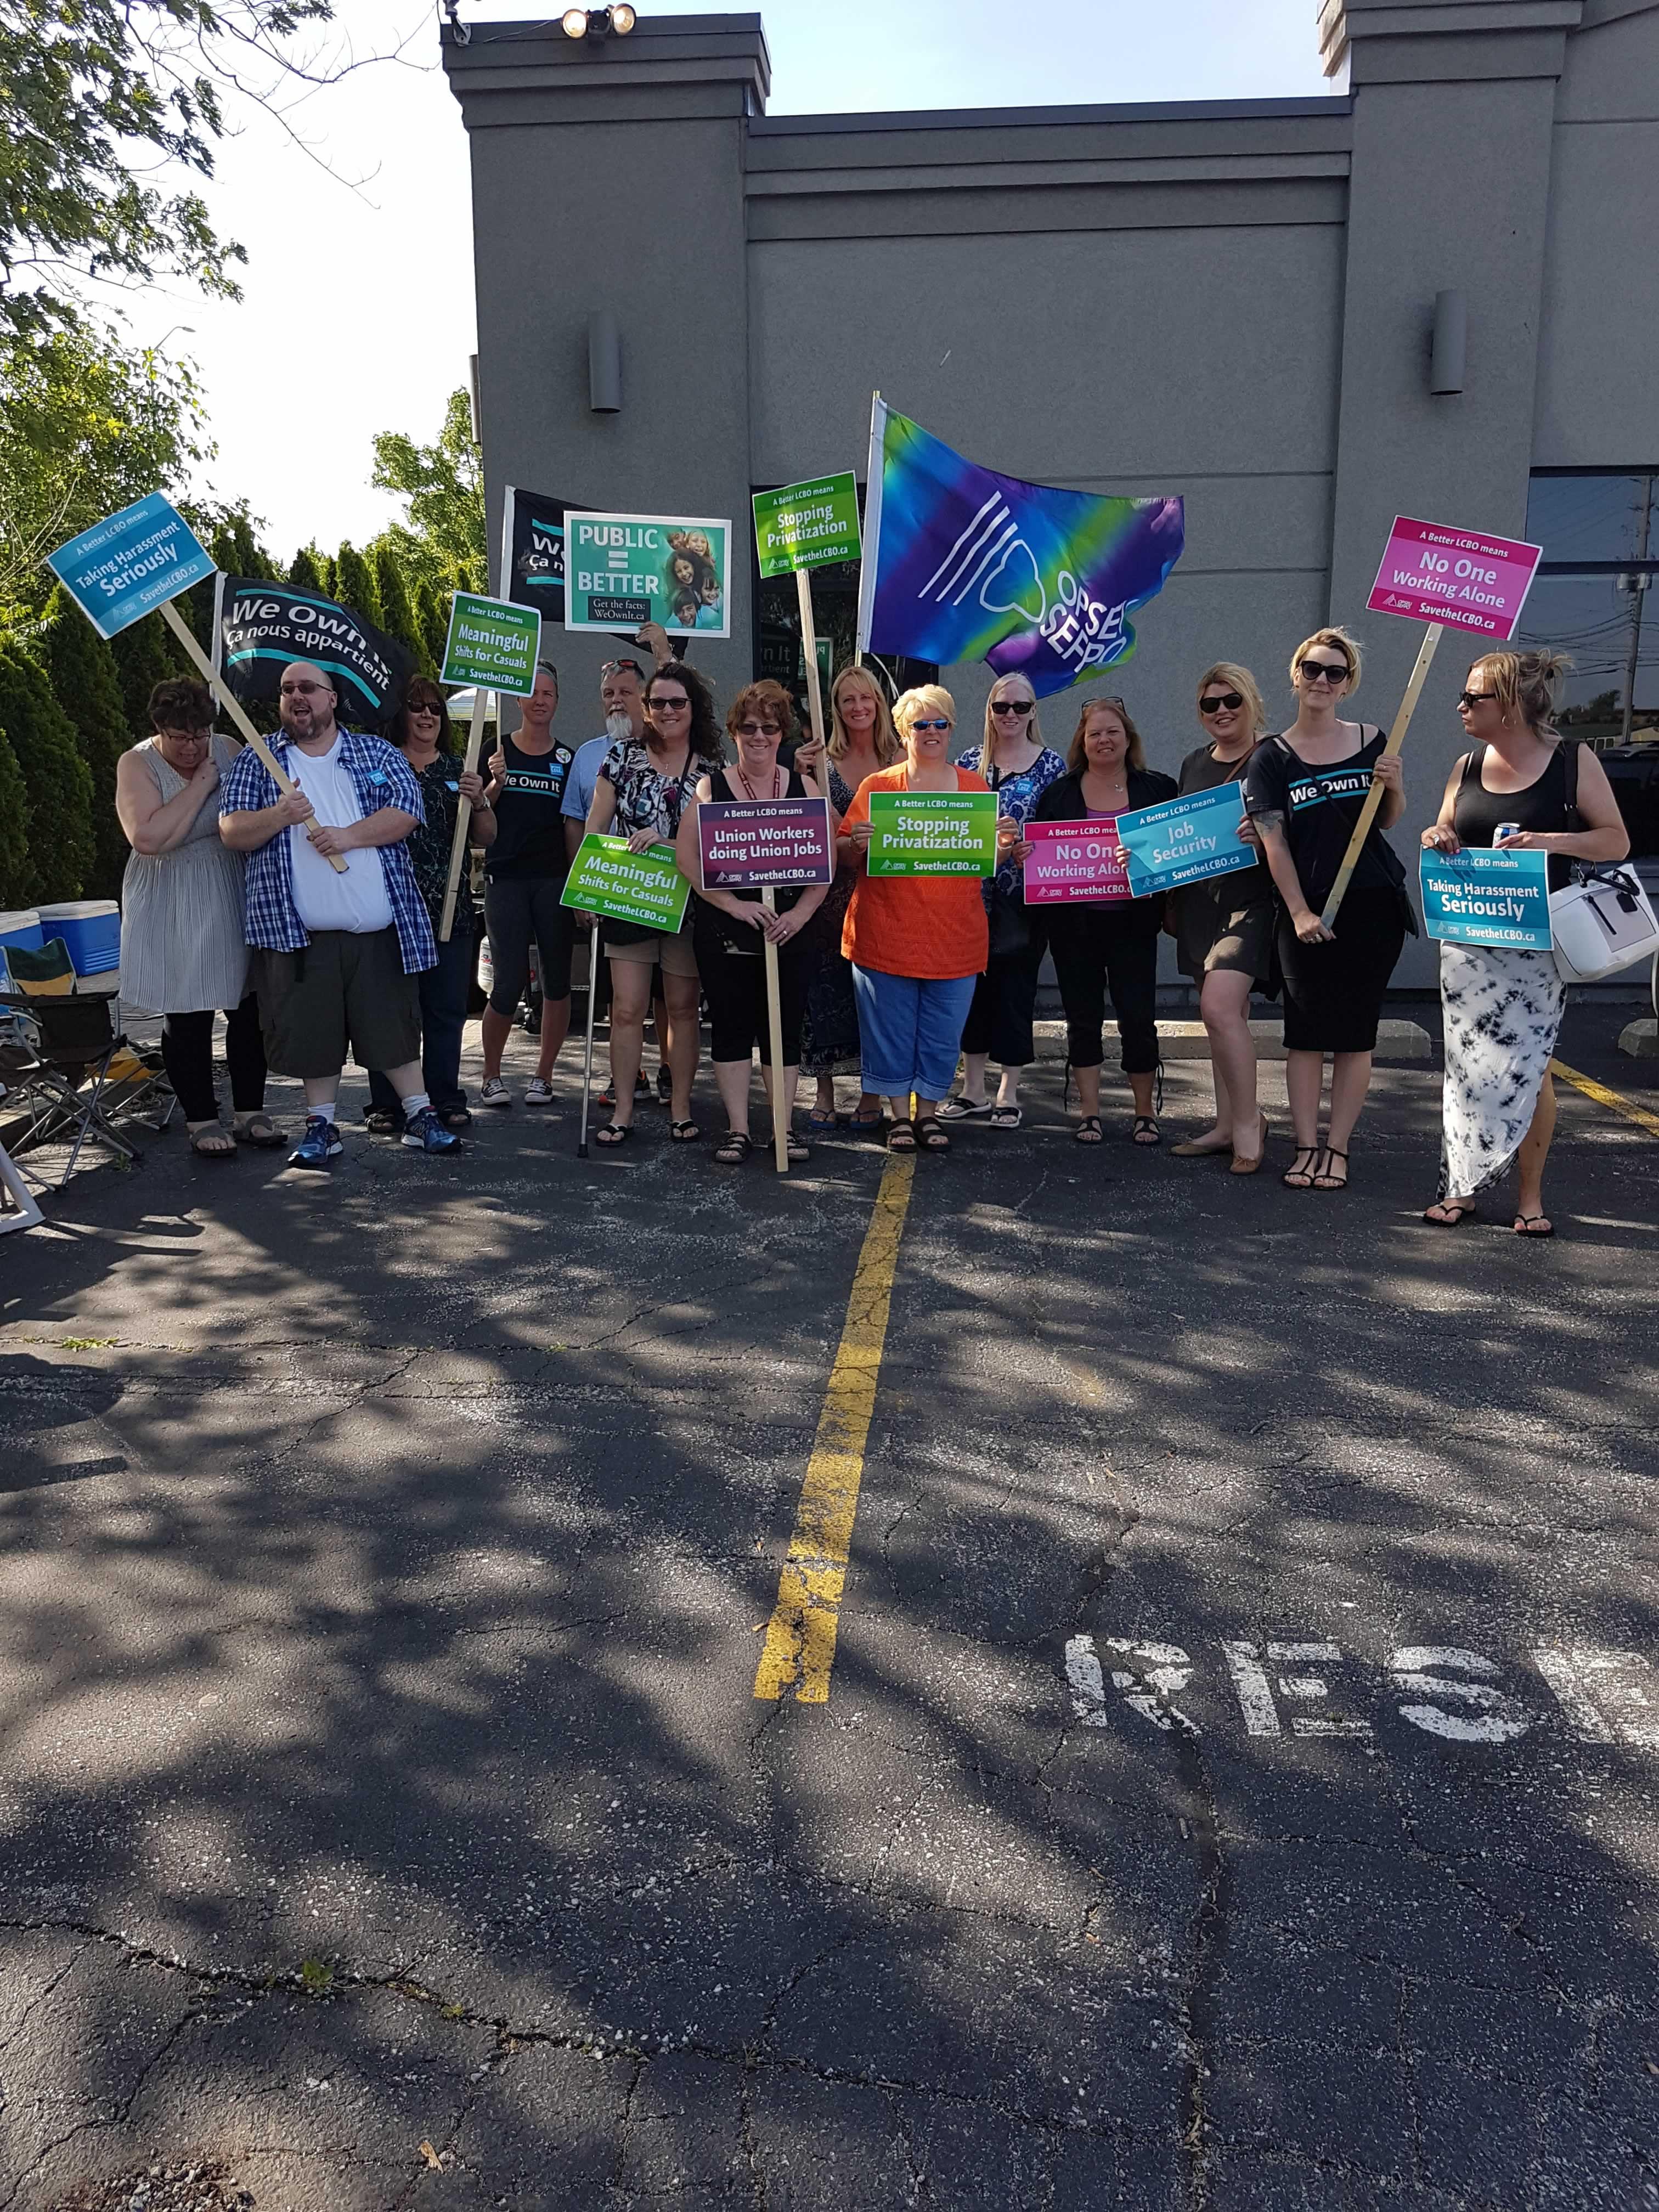 LCBO picket group in Windsor